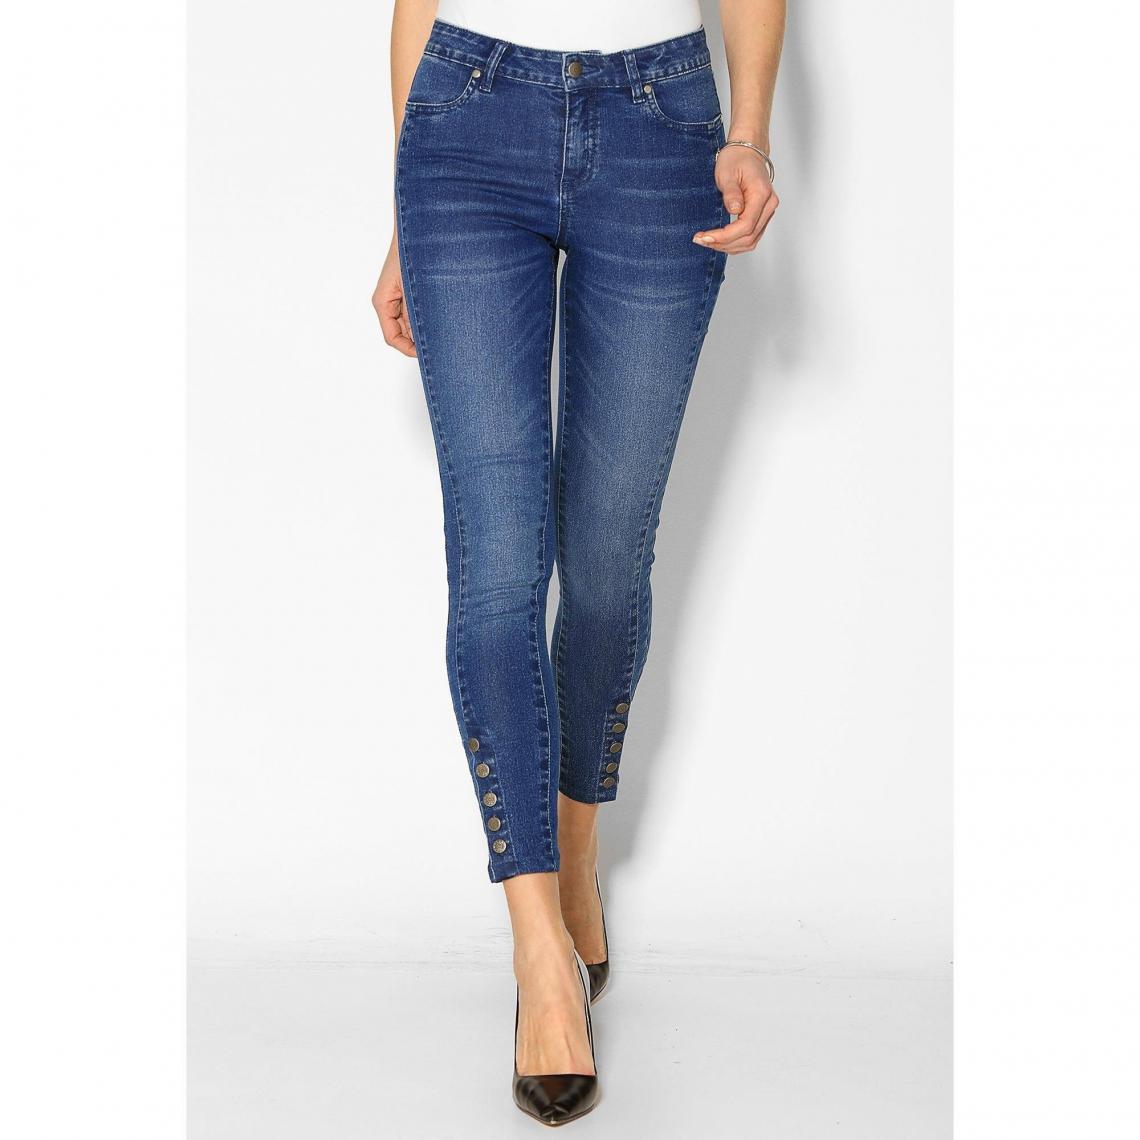 Jean skinny 5 poches bas boutonnés - Denim - 3 SUISSES - Modalova